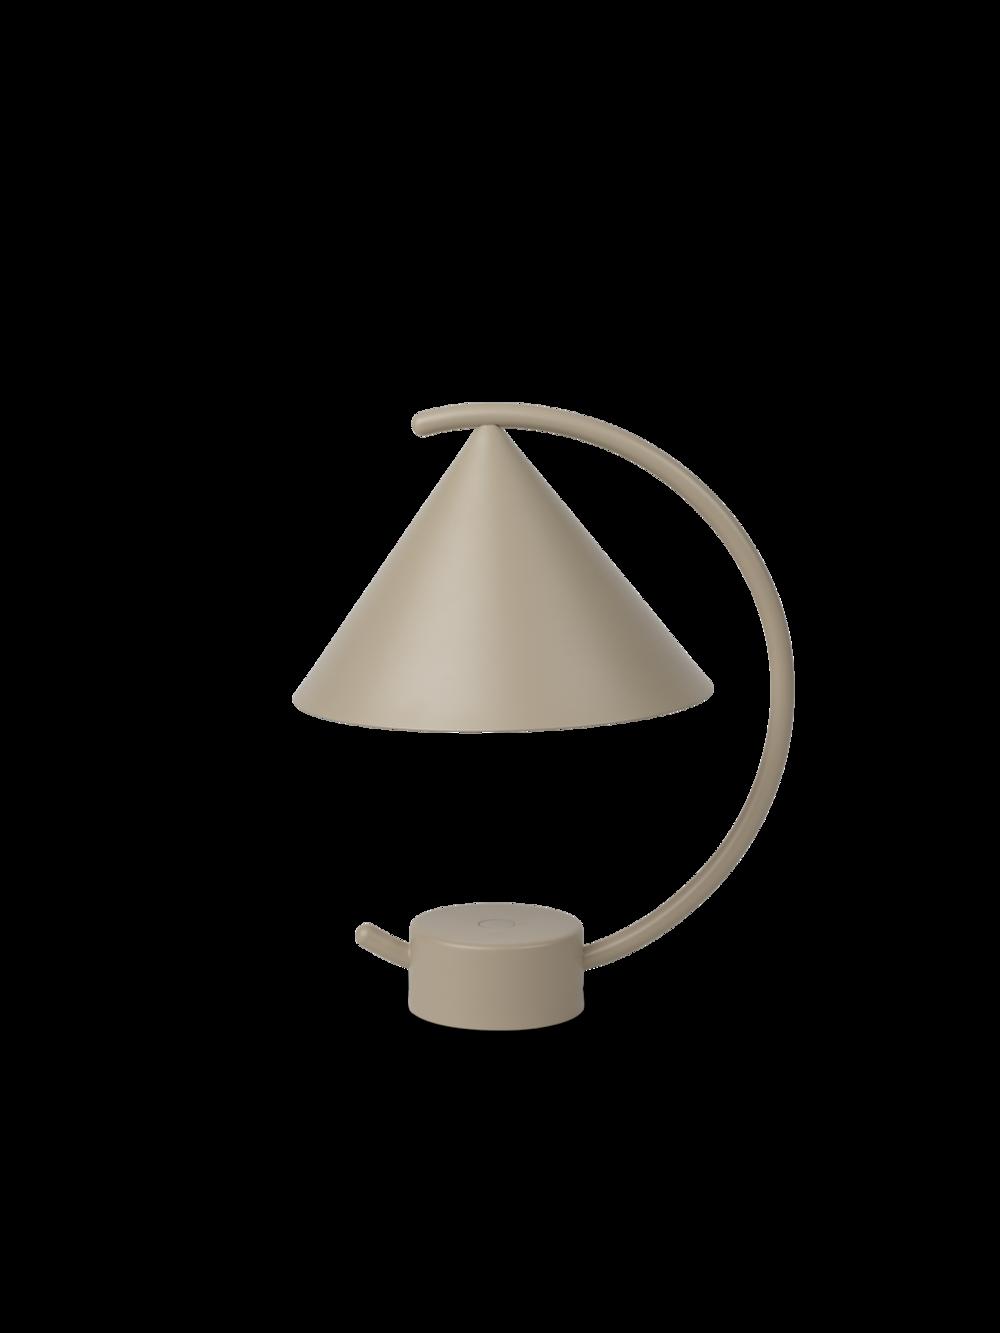 Ferm Living - Meridian Lamp - Cashmere (110174693)